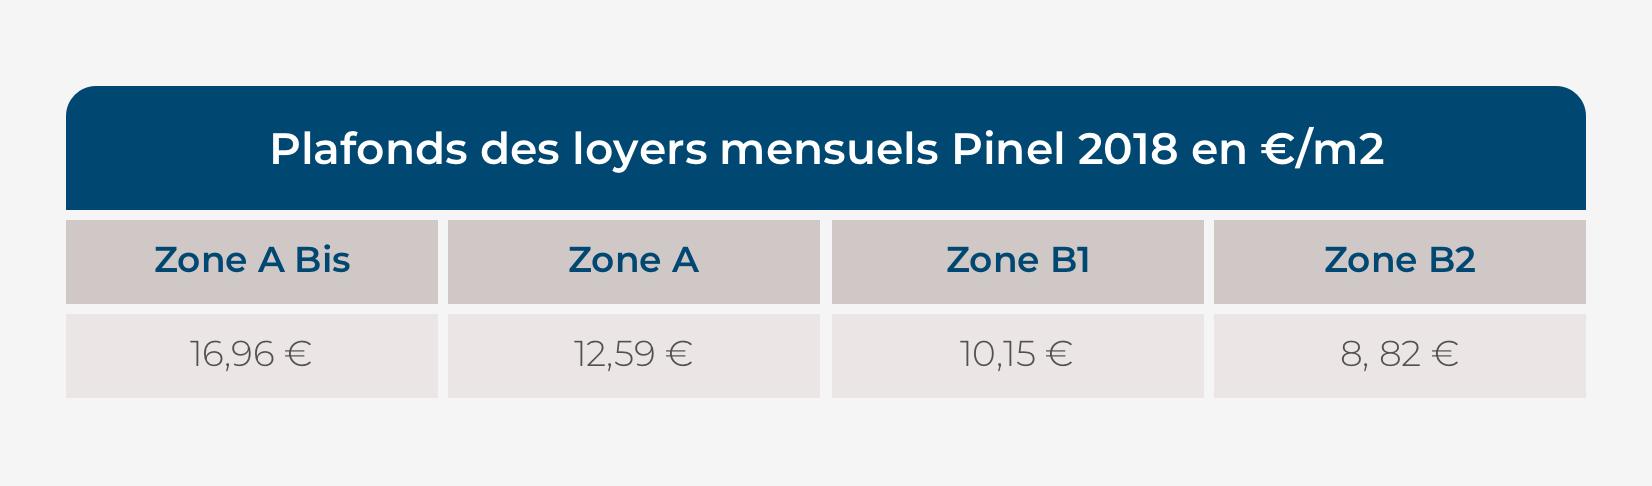 plafond_des_loyers_mensuels_pinel-2018_coffim